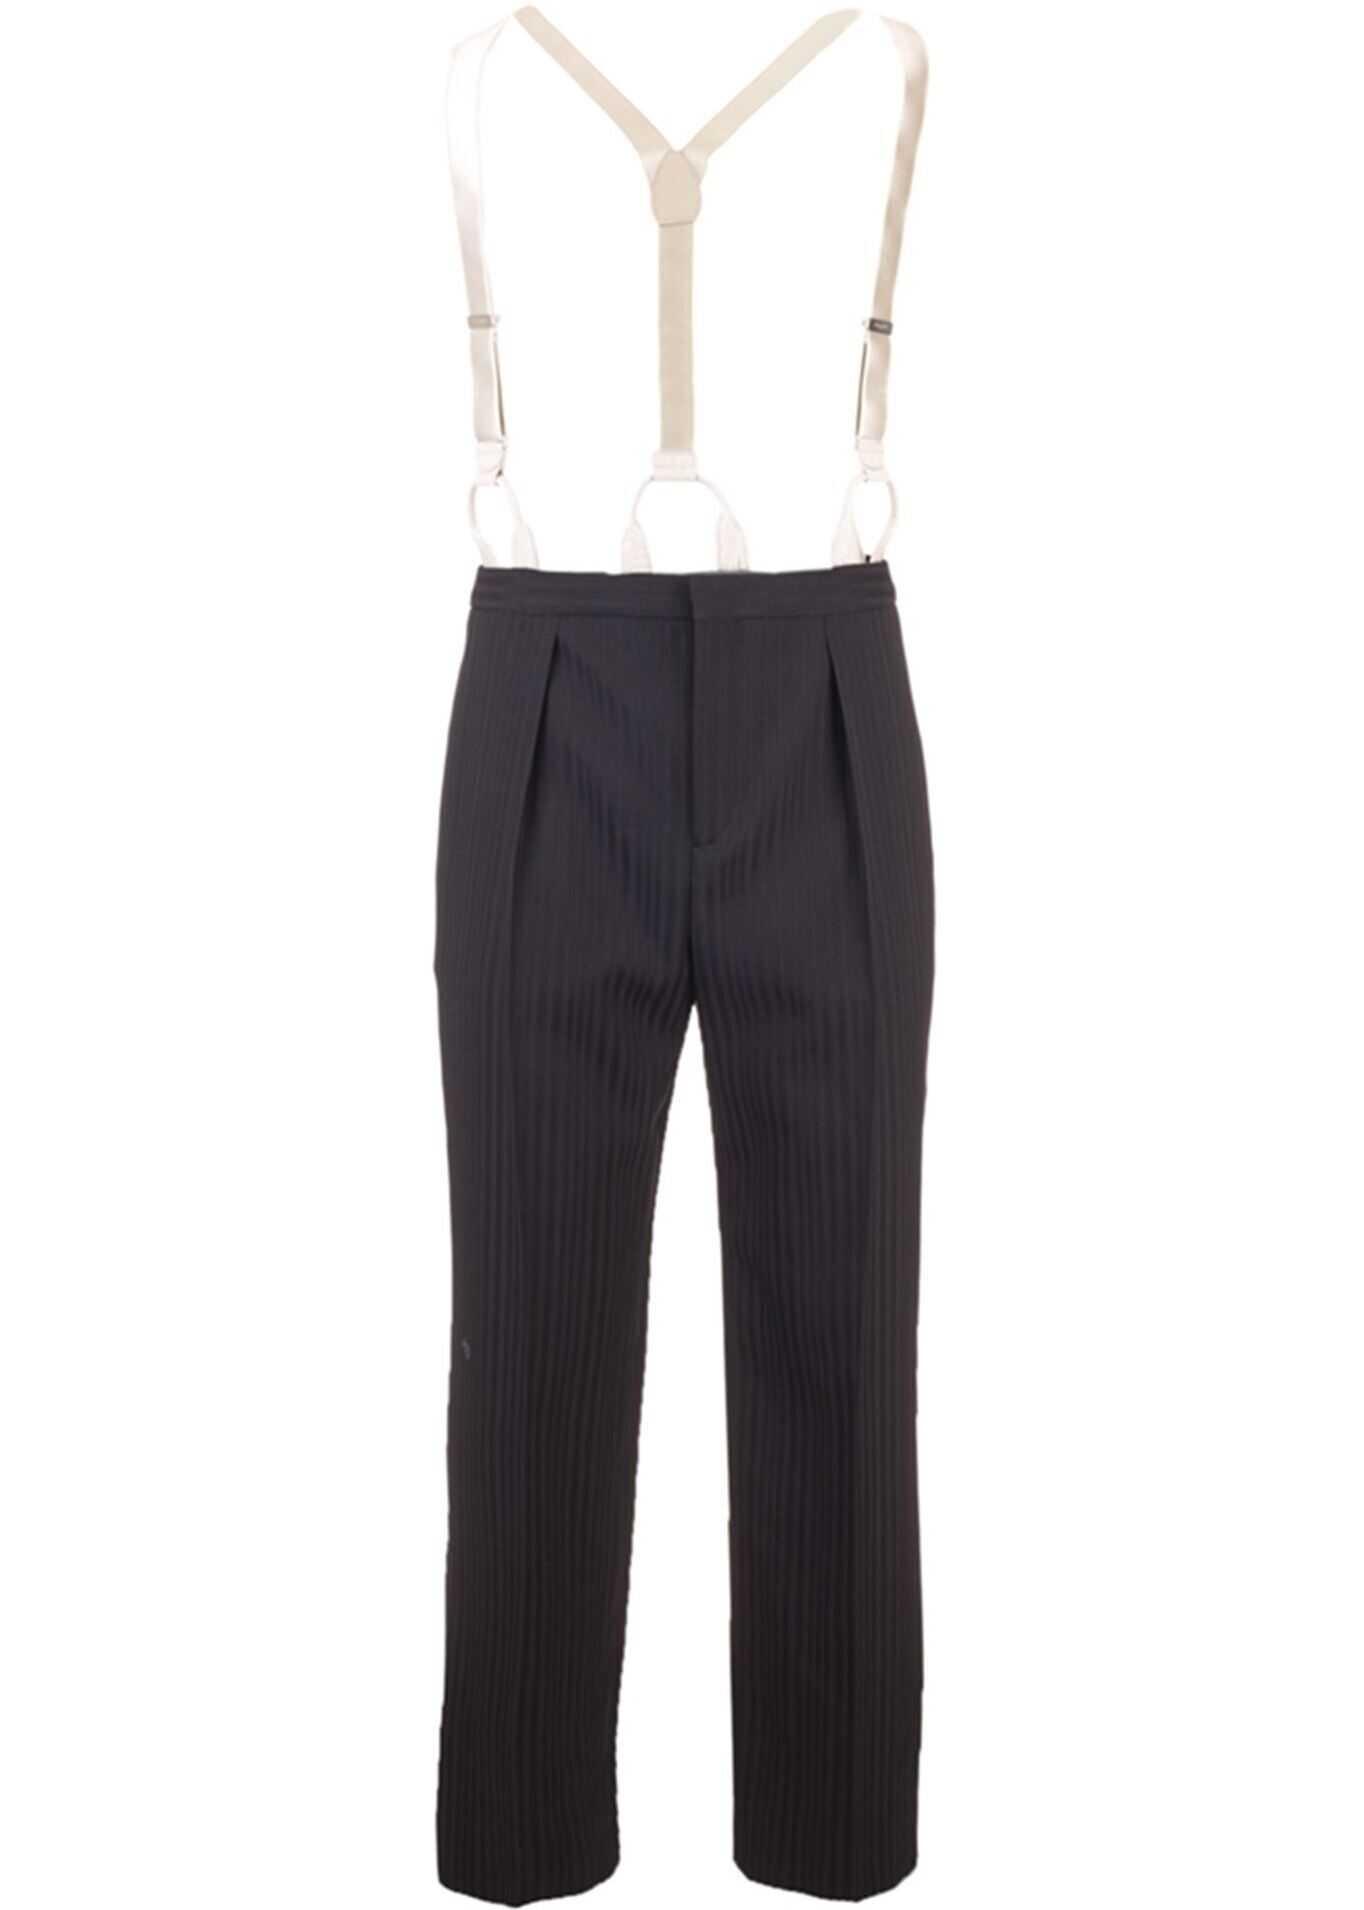 Saint Laurent Wool Pants In Black Black imagine